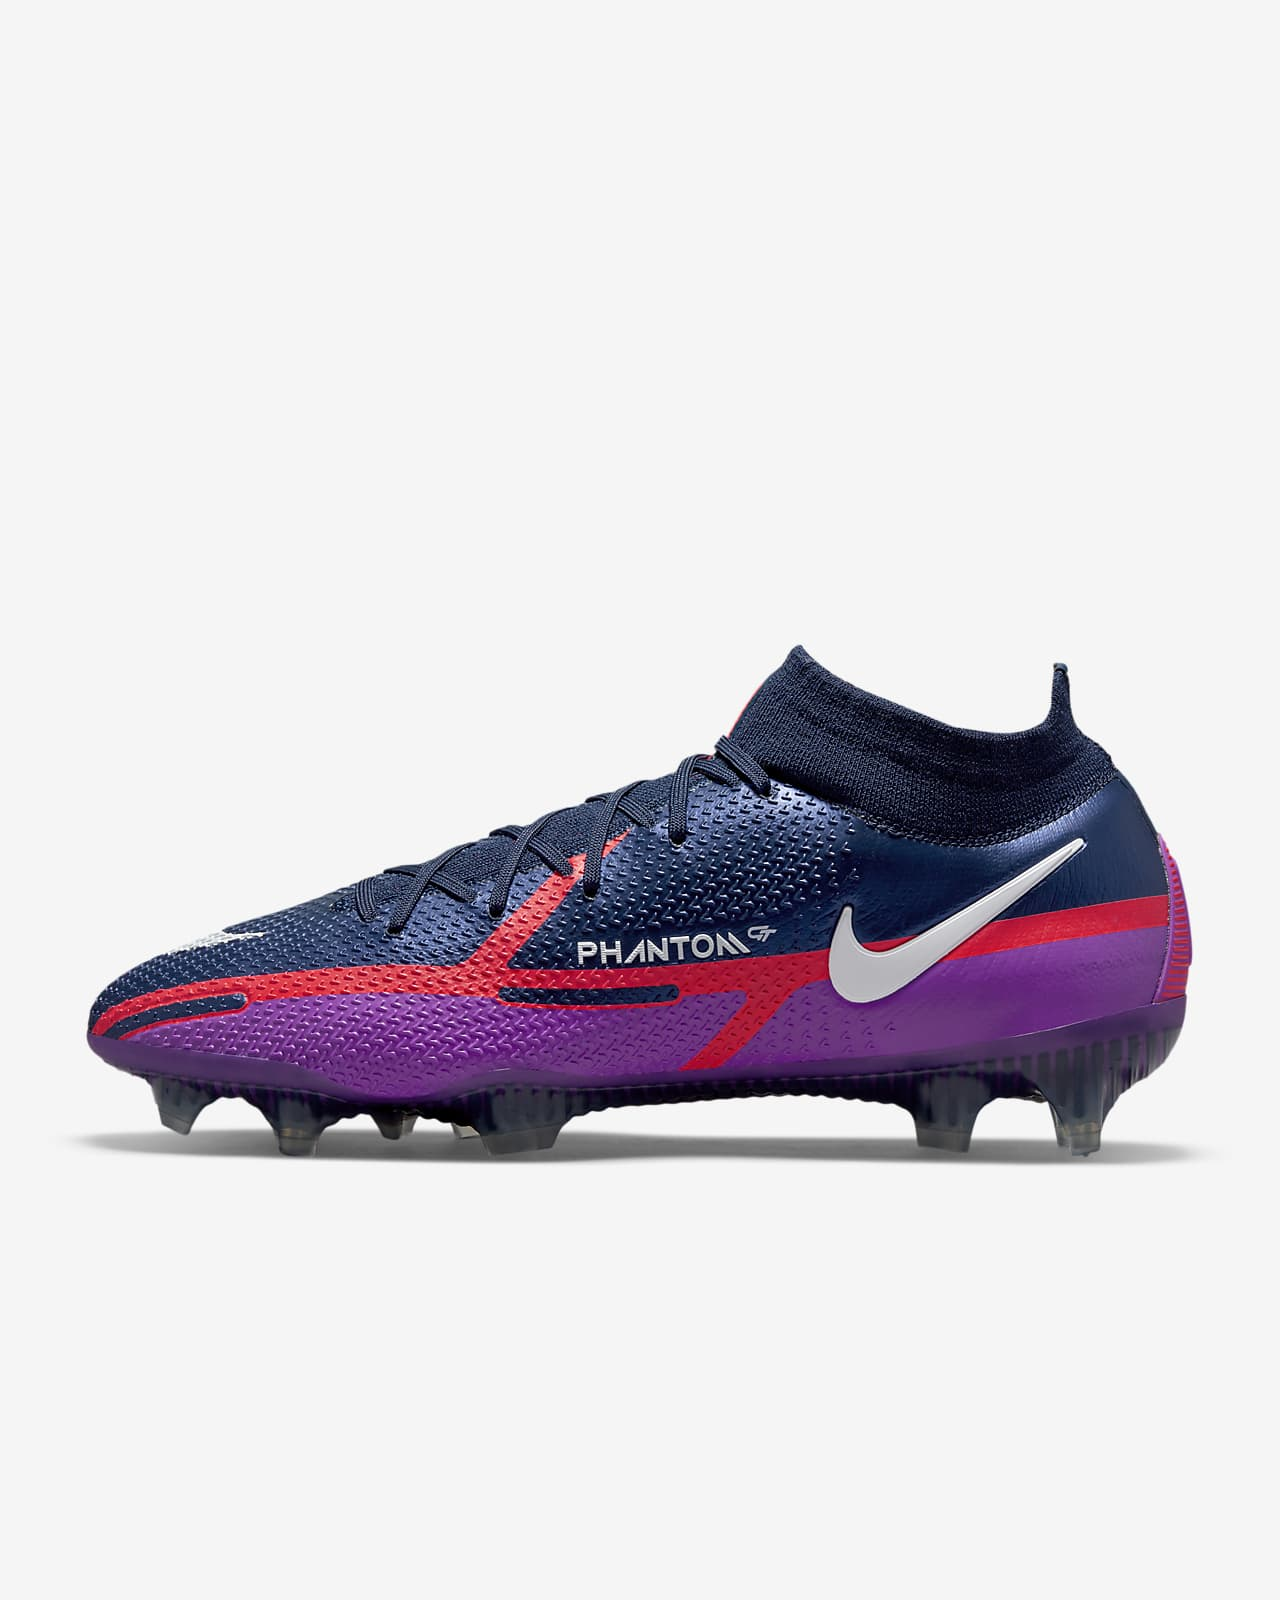 Nike Phantom GT2 Dynamic Fit Elite FG 天然偏硬草地足球釘鞋